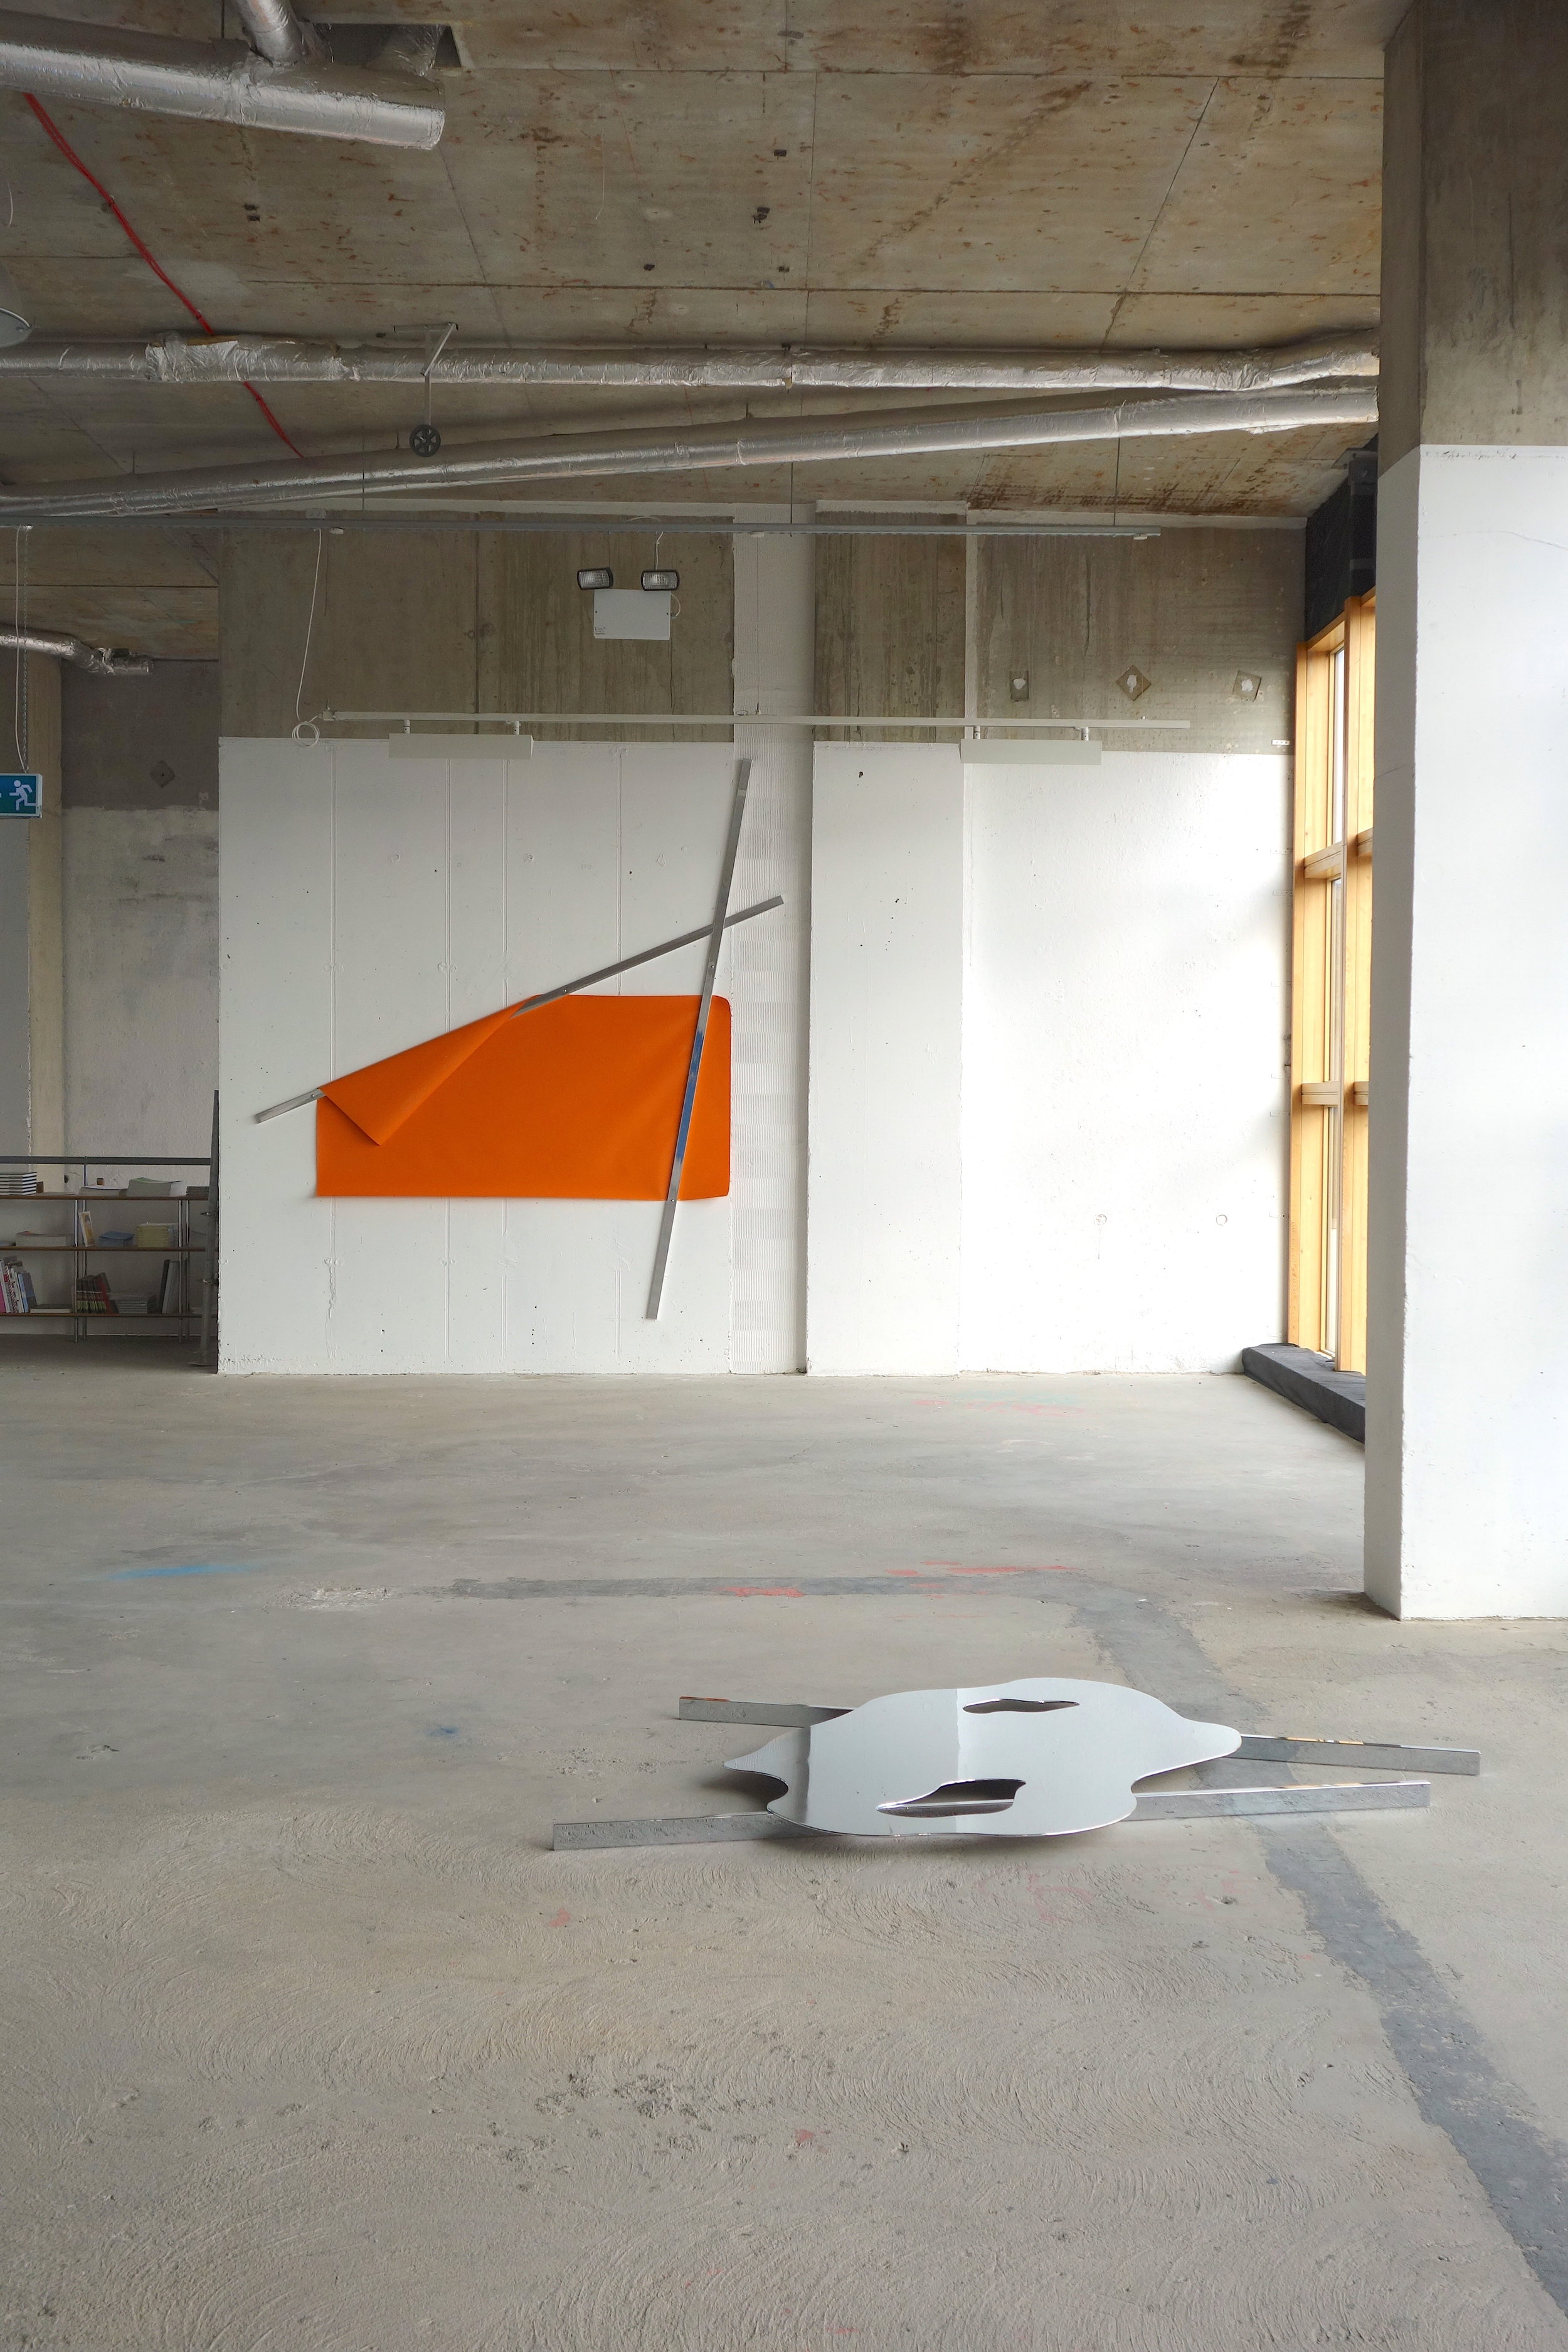 o.T., (untitled), 2009